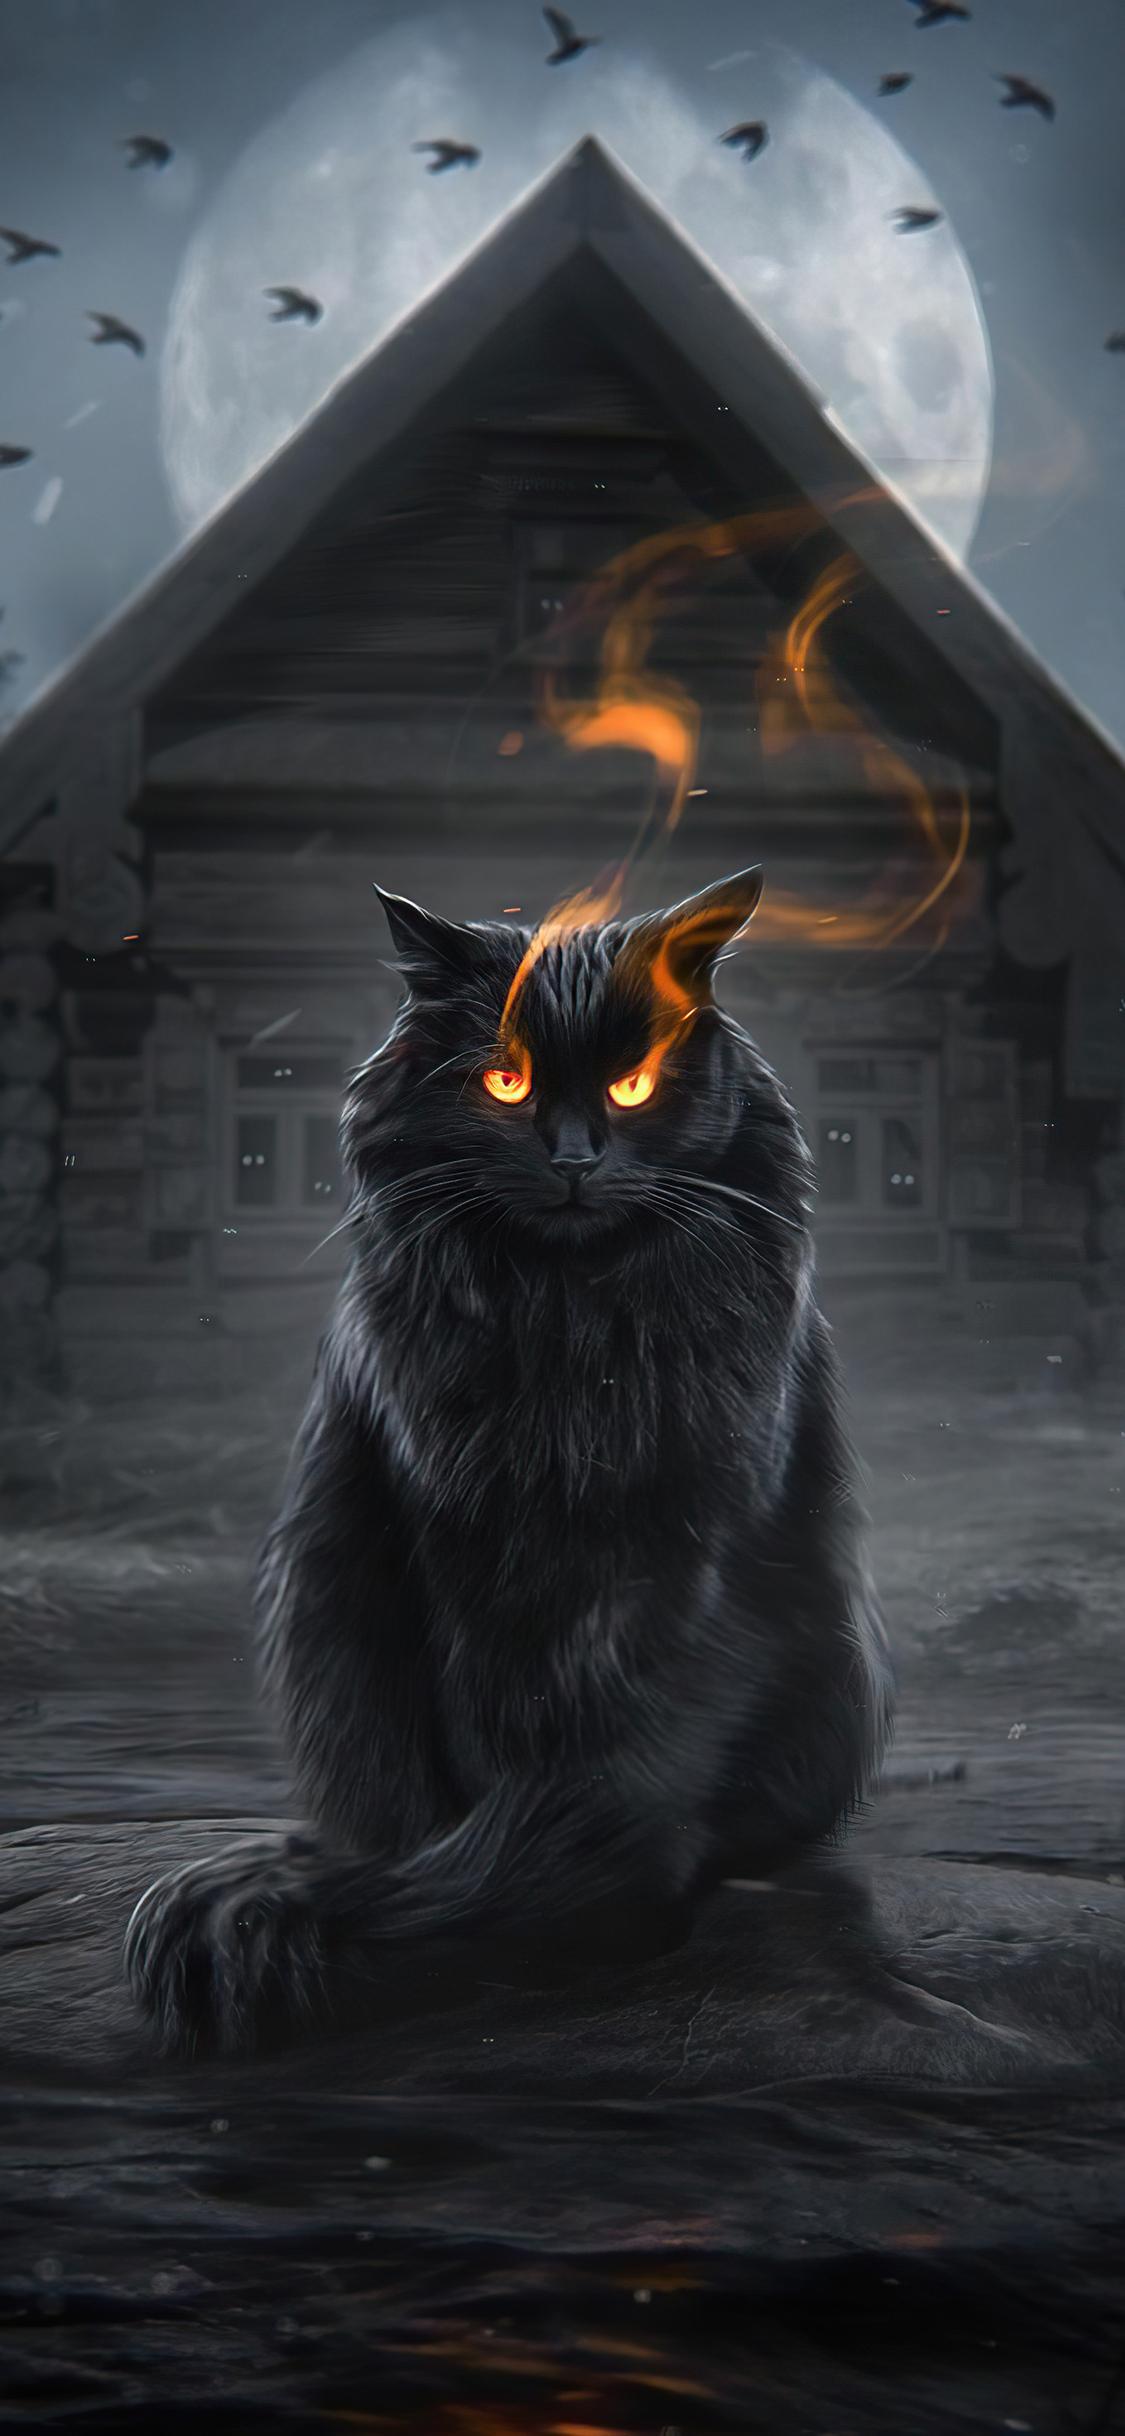 cat-fire-eyes-yx.jpg